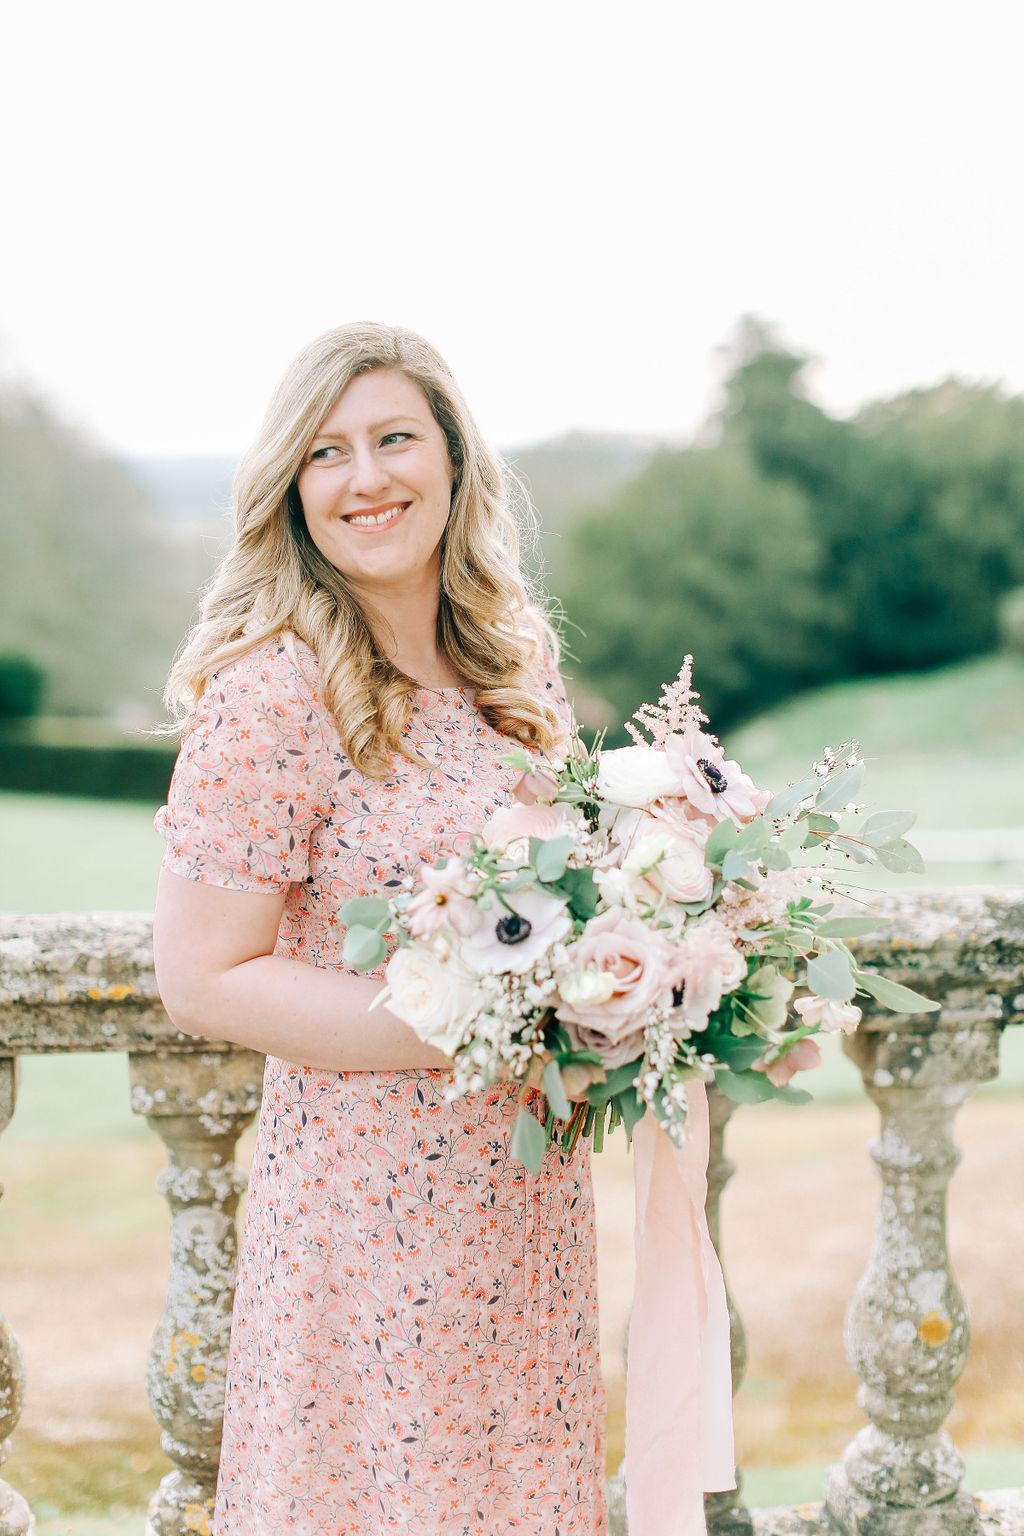 Zoe florist at Flourish and Grace wedding flowers south west